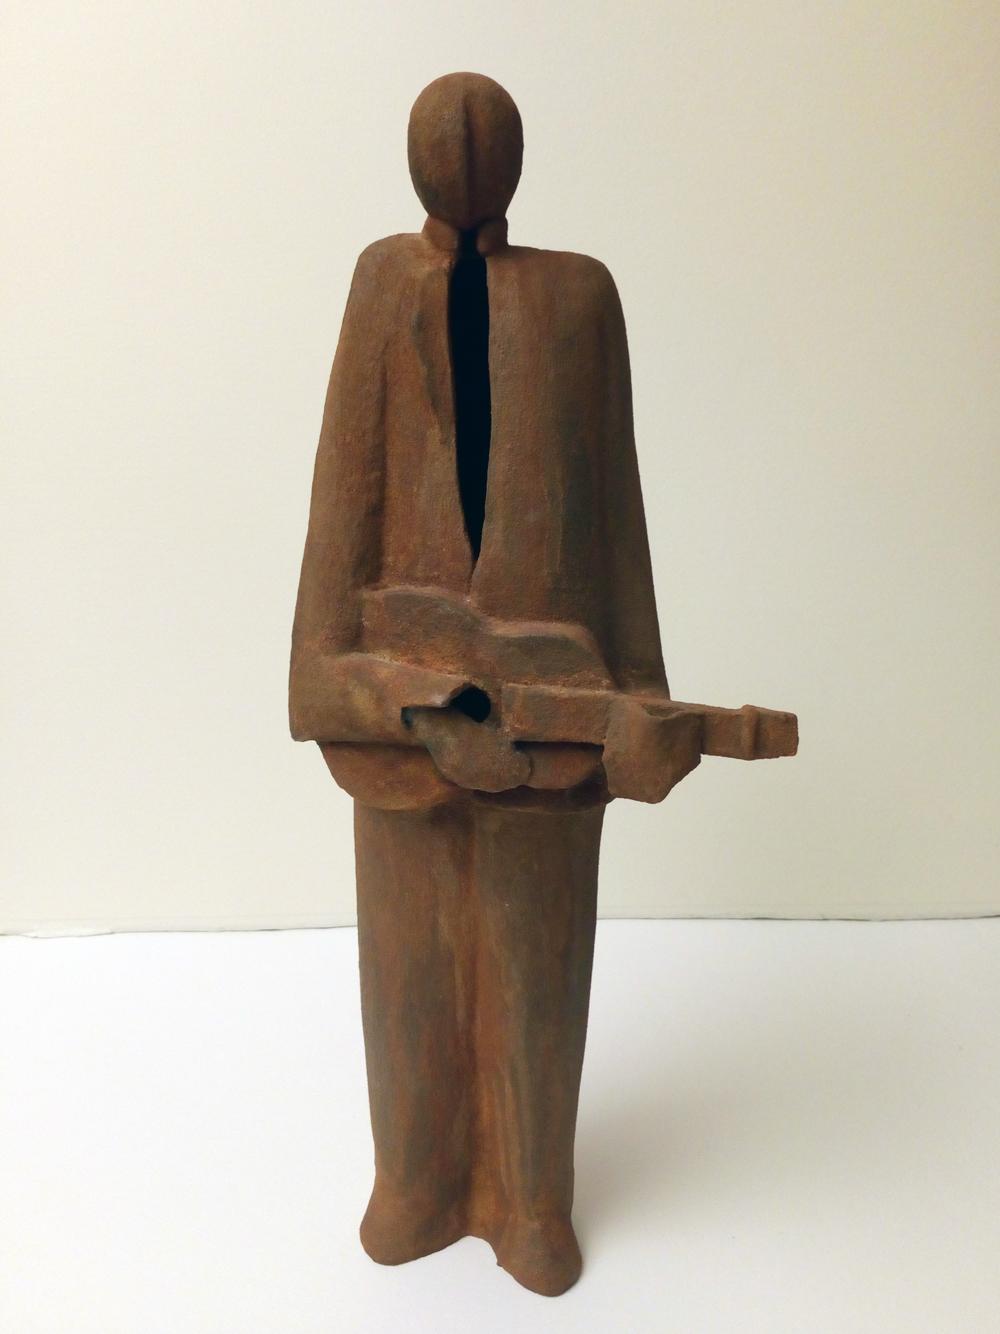 Lars-Lennart Stenberg Skulptur   Patinerat stengods  H43 x B17 x D14 cm  4 500 kr